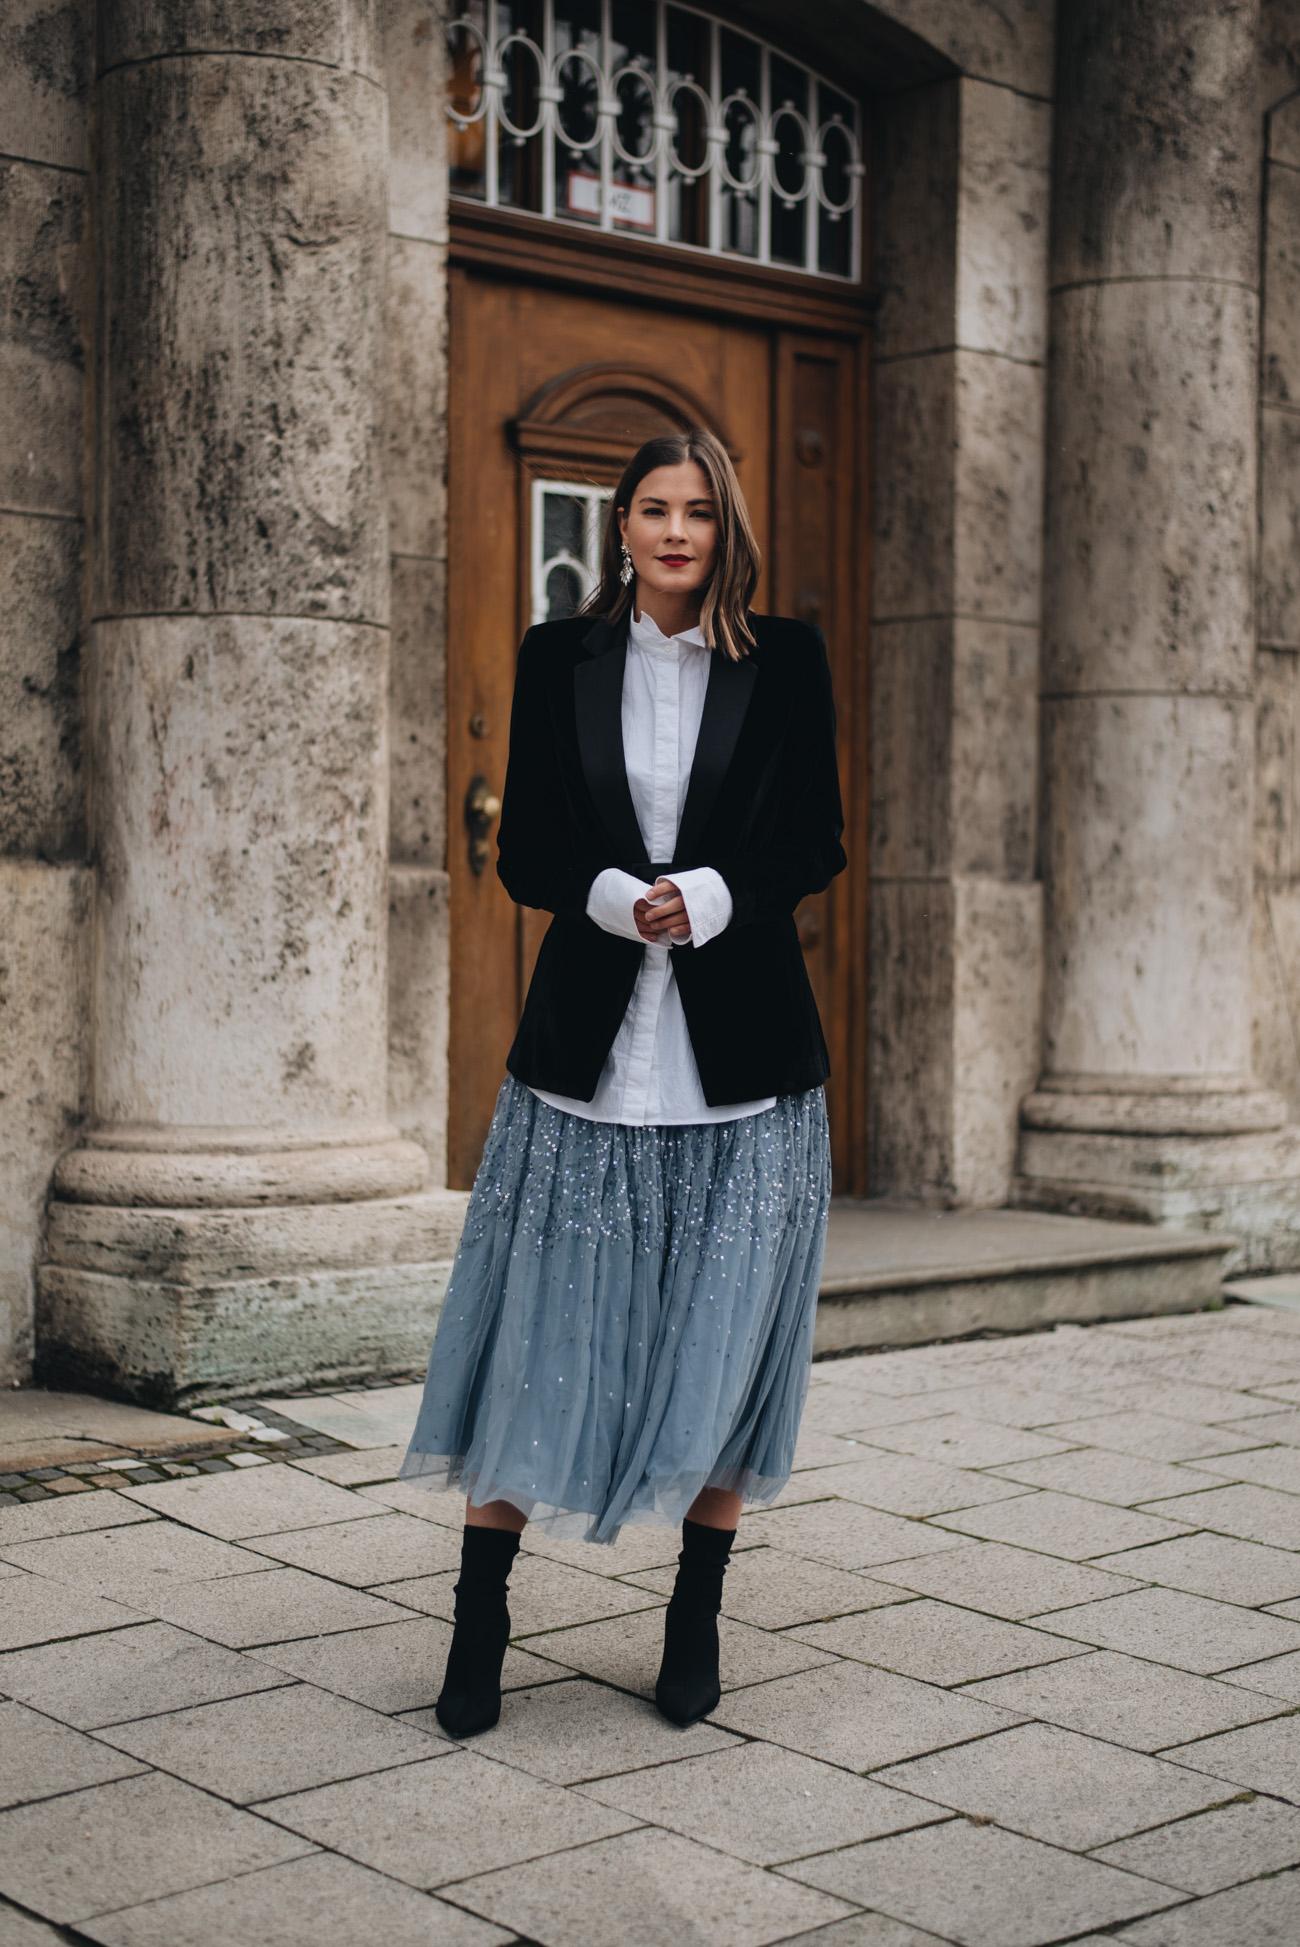 Styling-Tipps-Tüllrock-Lagenlook-mode-bloggerin-nina-schwichtenberg-streetstyle-mode-trends-2018-fashiioncarpet